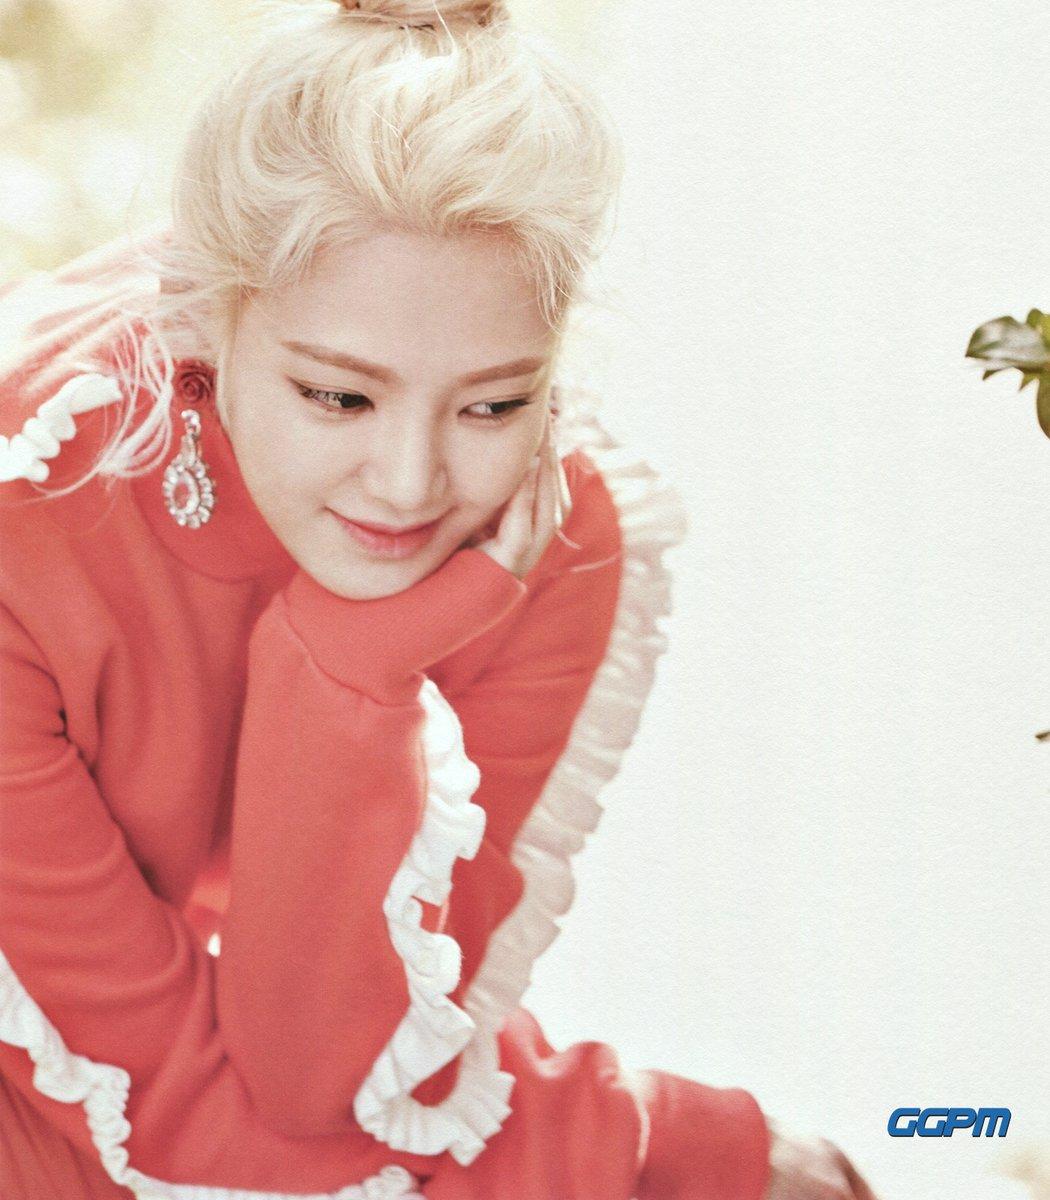 Htyoyeon 2017 SEASON'S GREETINGS 'Ordinary Days'